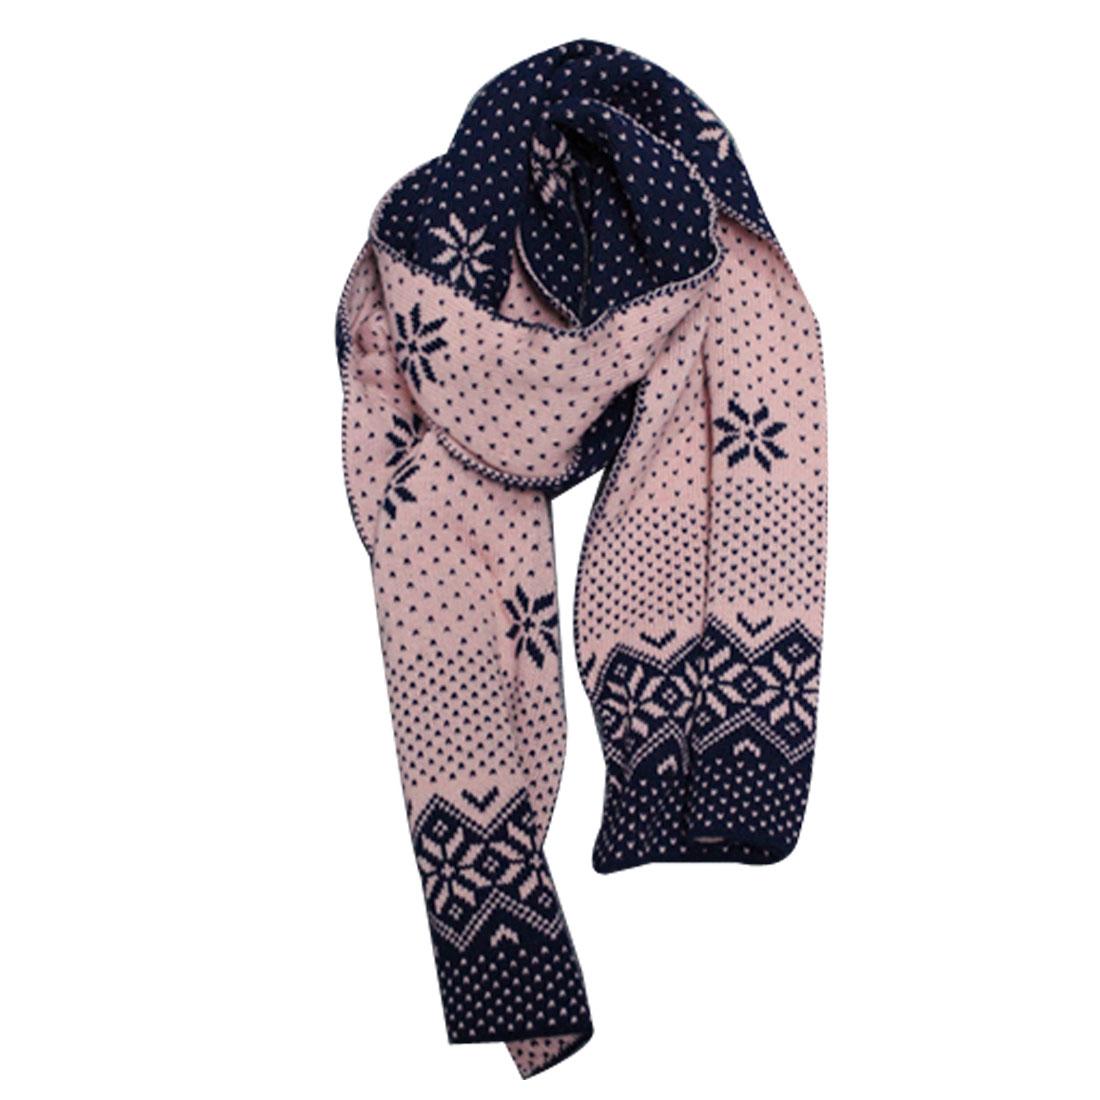 Mens Black Dark Blue Snowflakes Pattern Knitting Neck Warmer Scarf